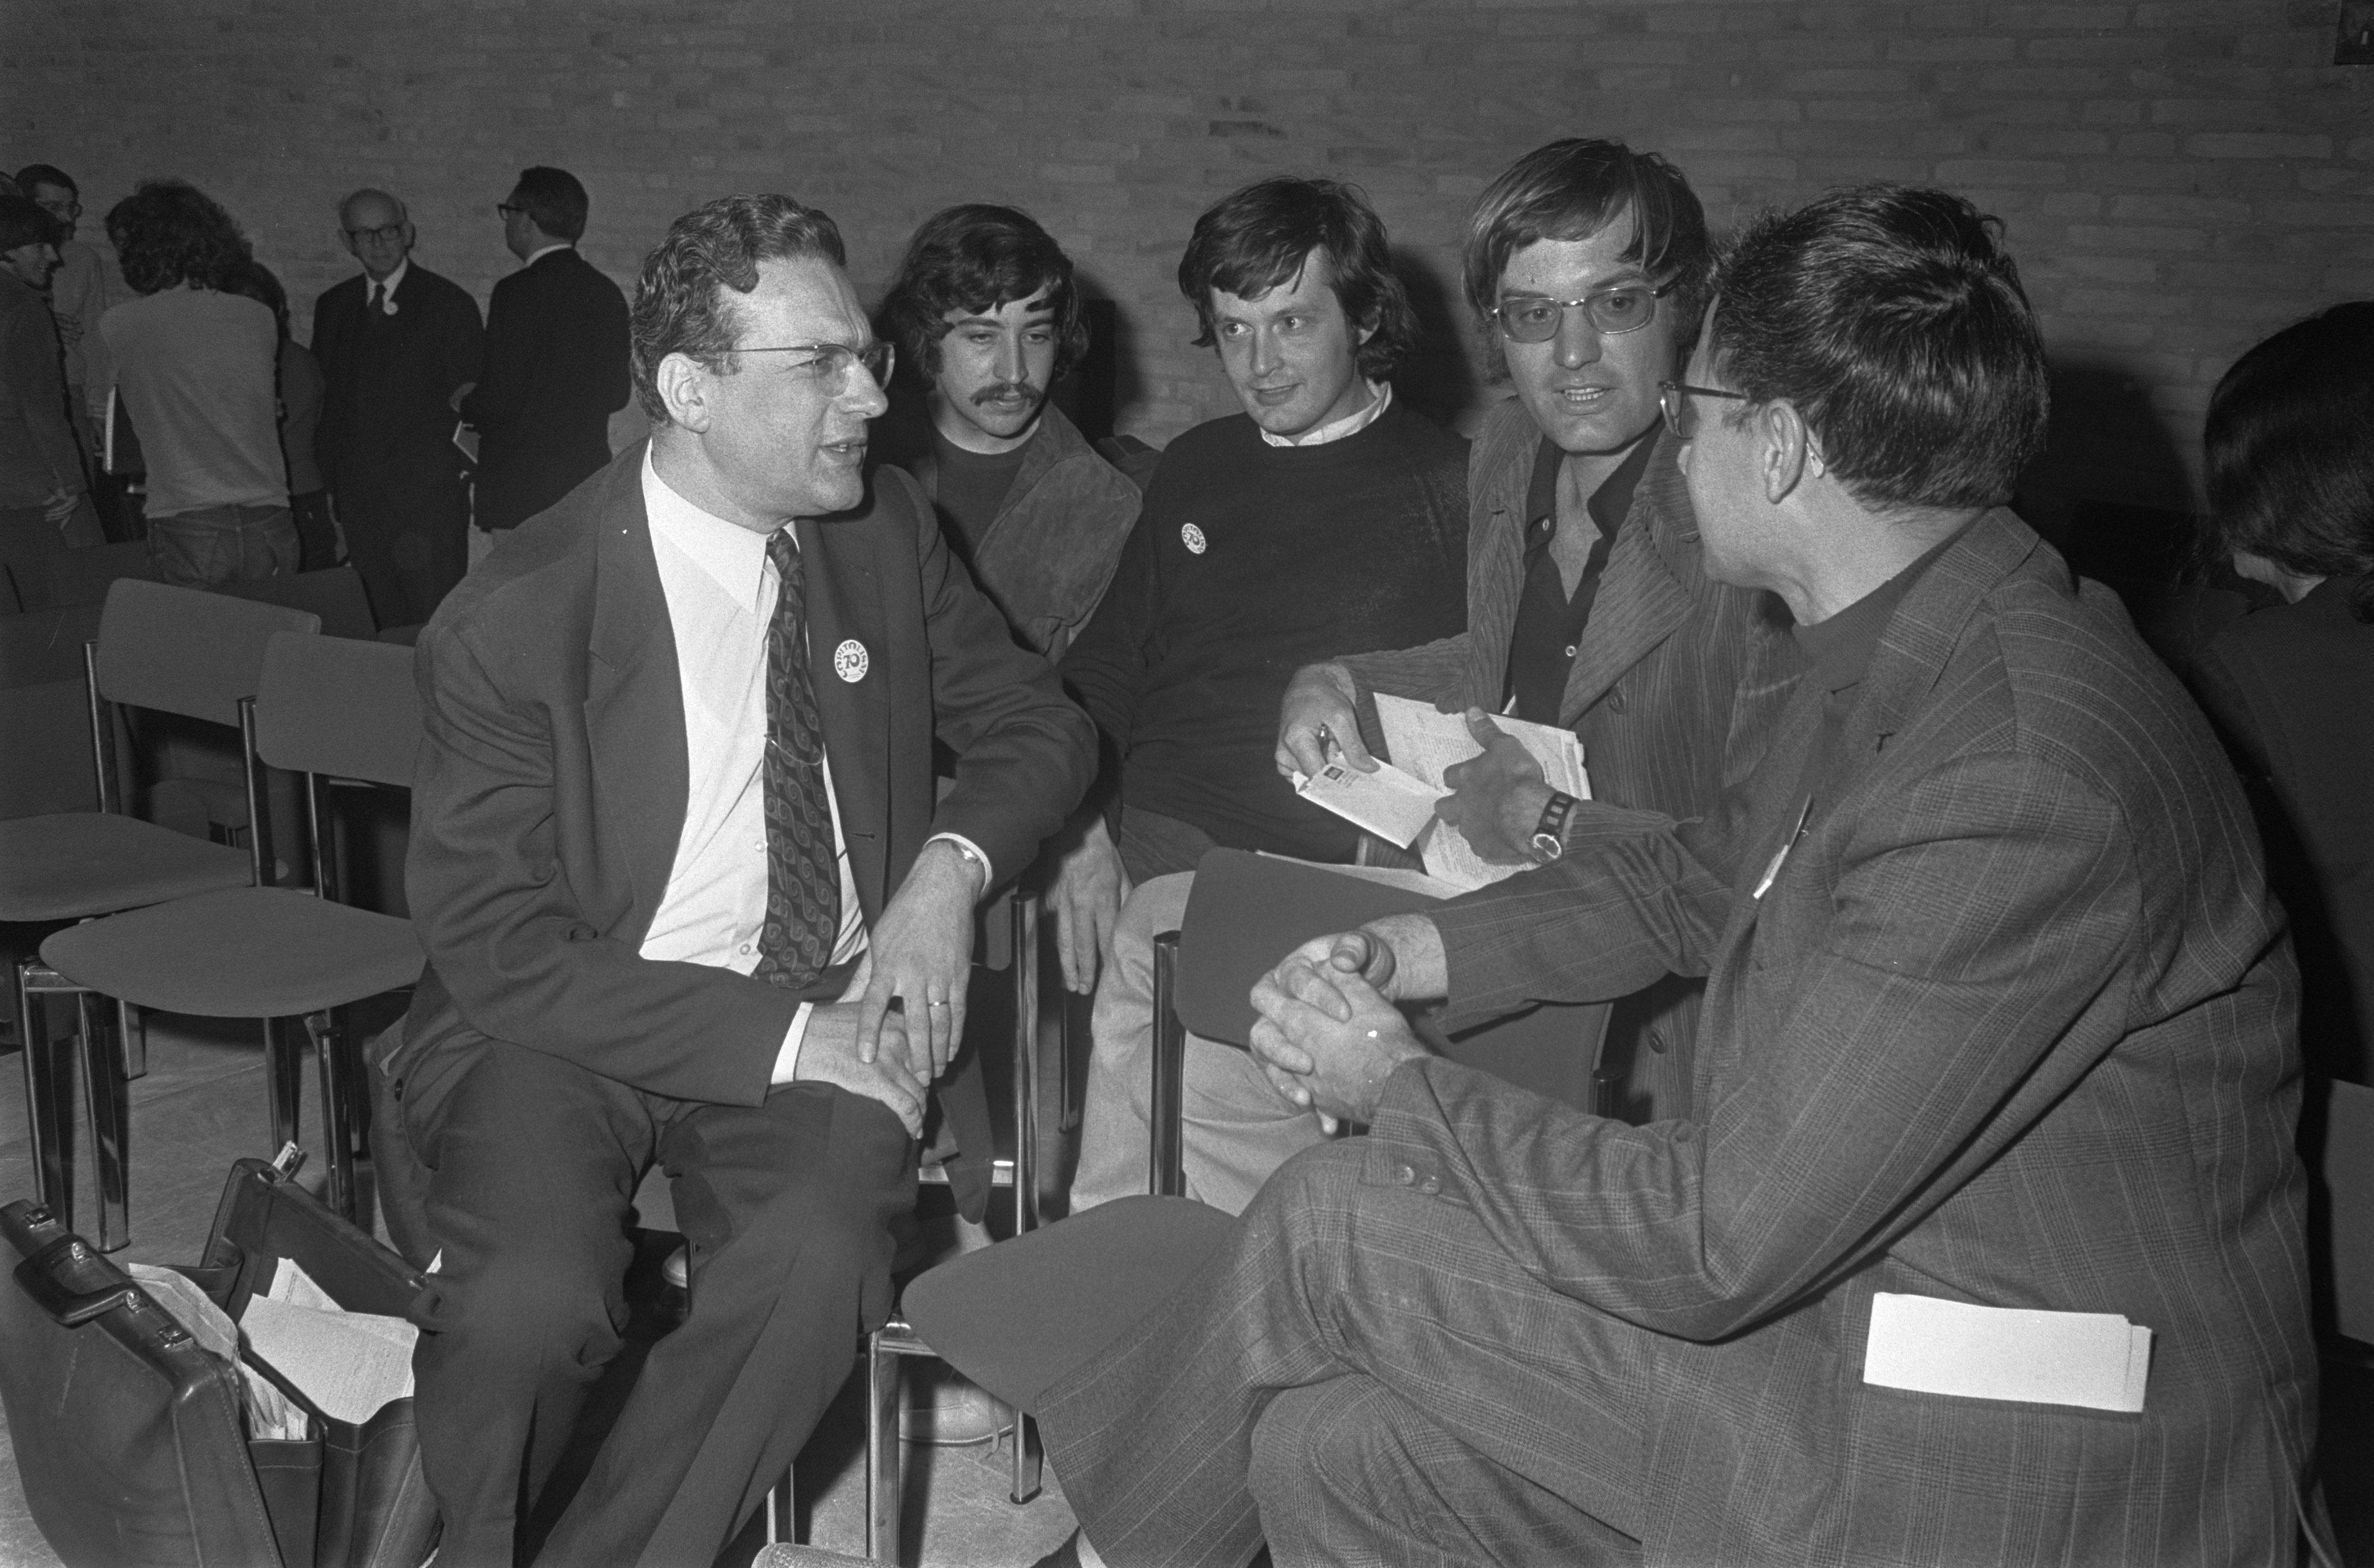 Congress on ''Capitalism in the seventies'', Tilburg, the Netherlands (1970). Left to right: [[Ernst Mandel]], Herbert Gintis, [[Bob Rowthorn]], [[Elmar Altvater]] and organiser [[Theo van de Klundert]]